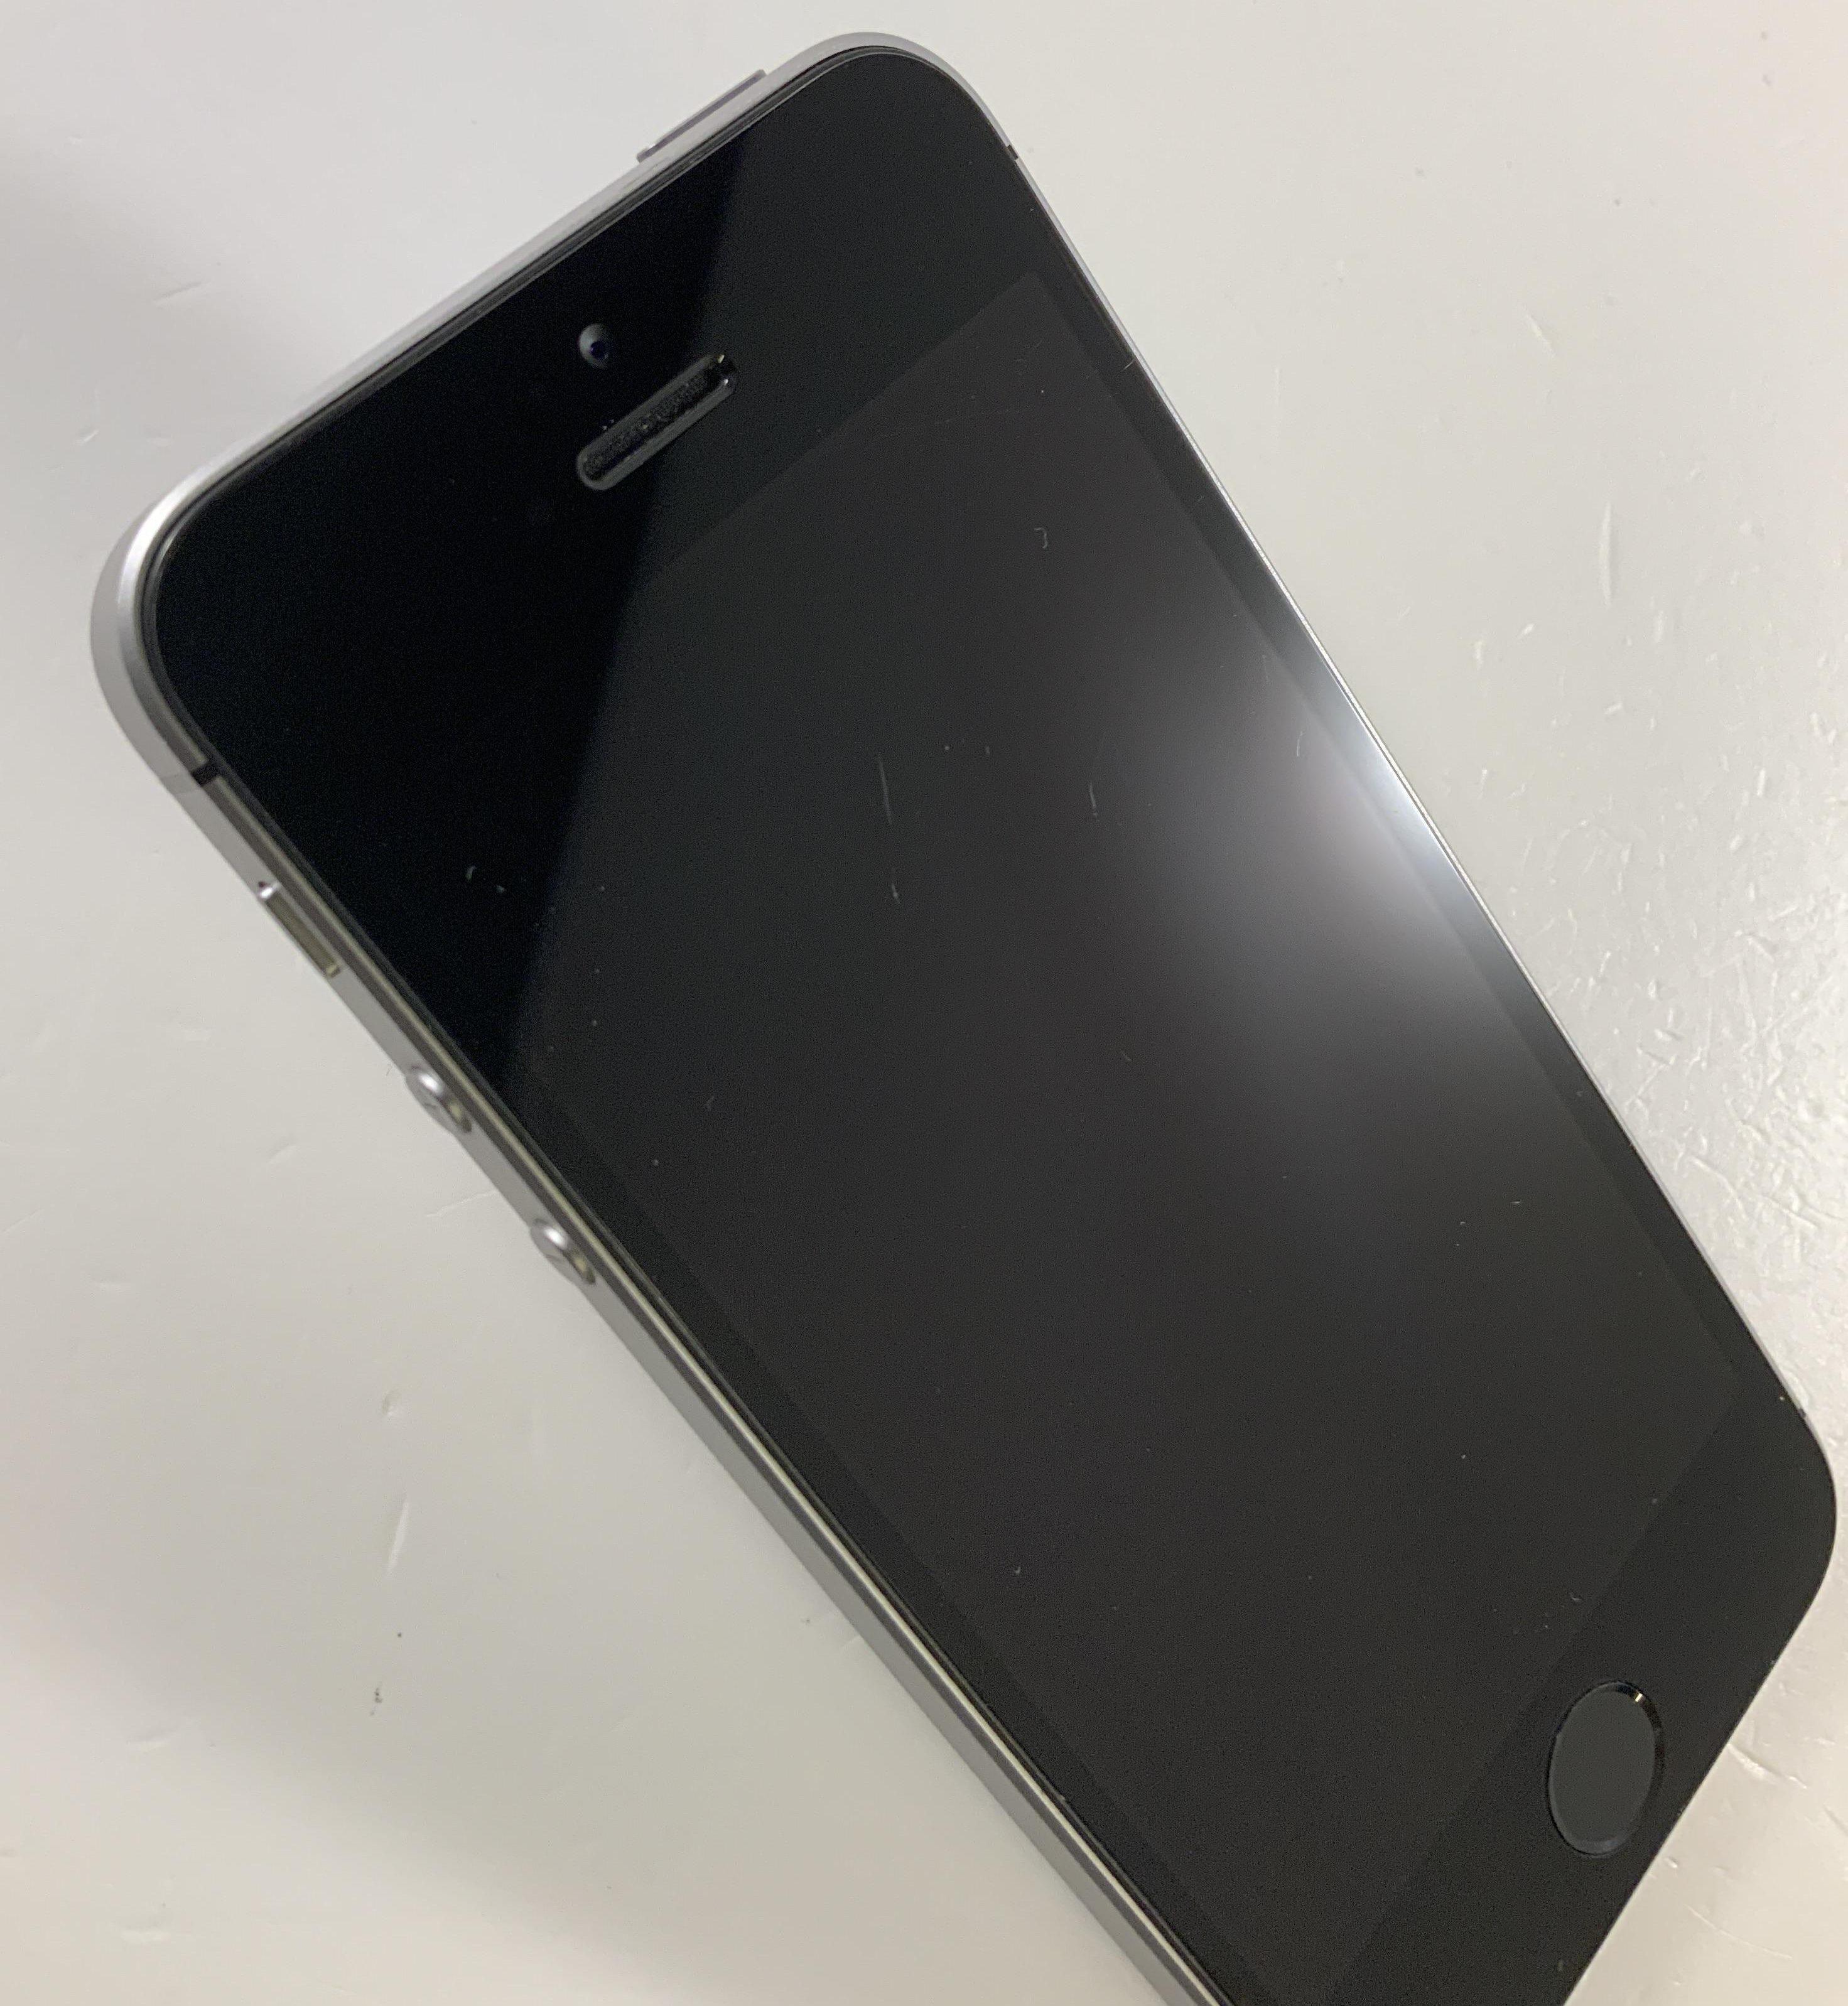 iPhone SE 32GB, 32GB, Space Gray, bild 3